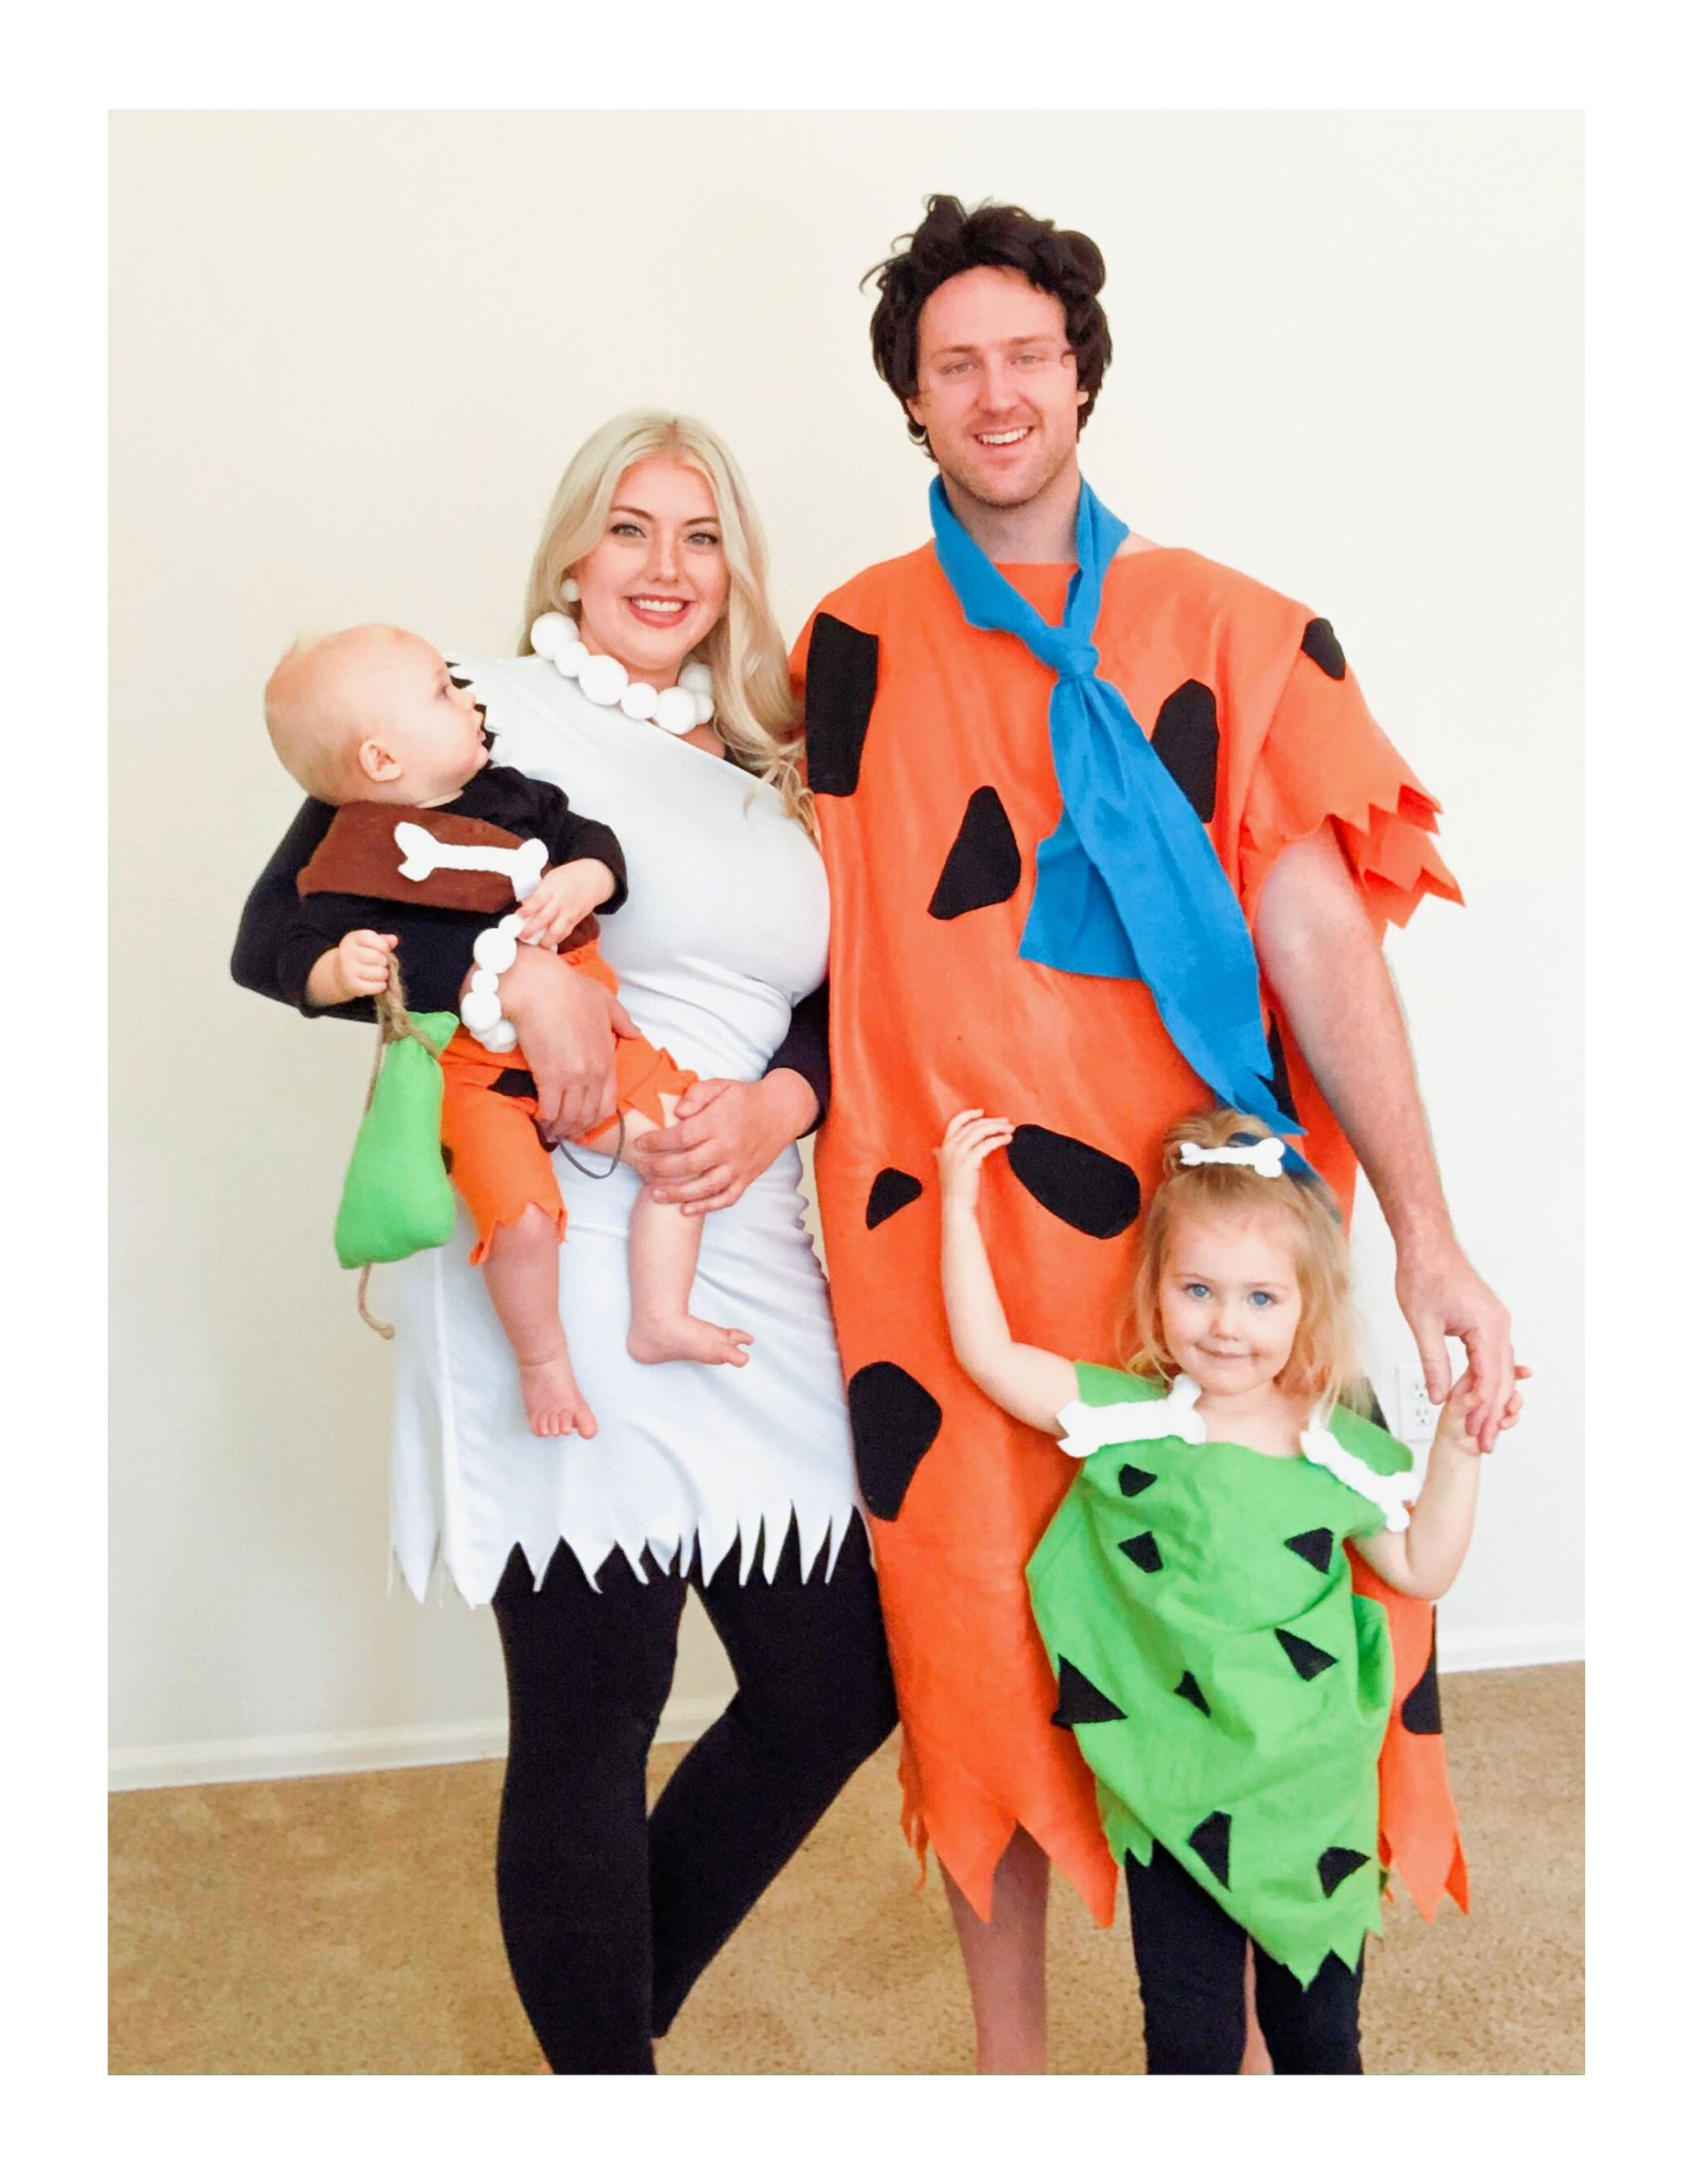 Flintstone costumes-family costumes -pebbles costume-bam bam costume